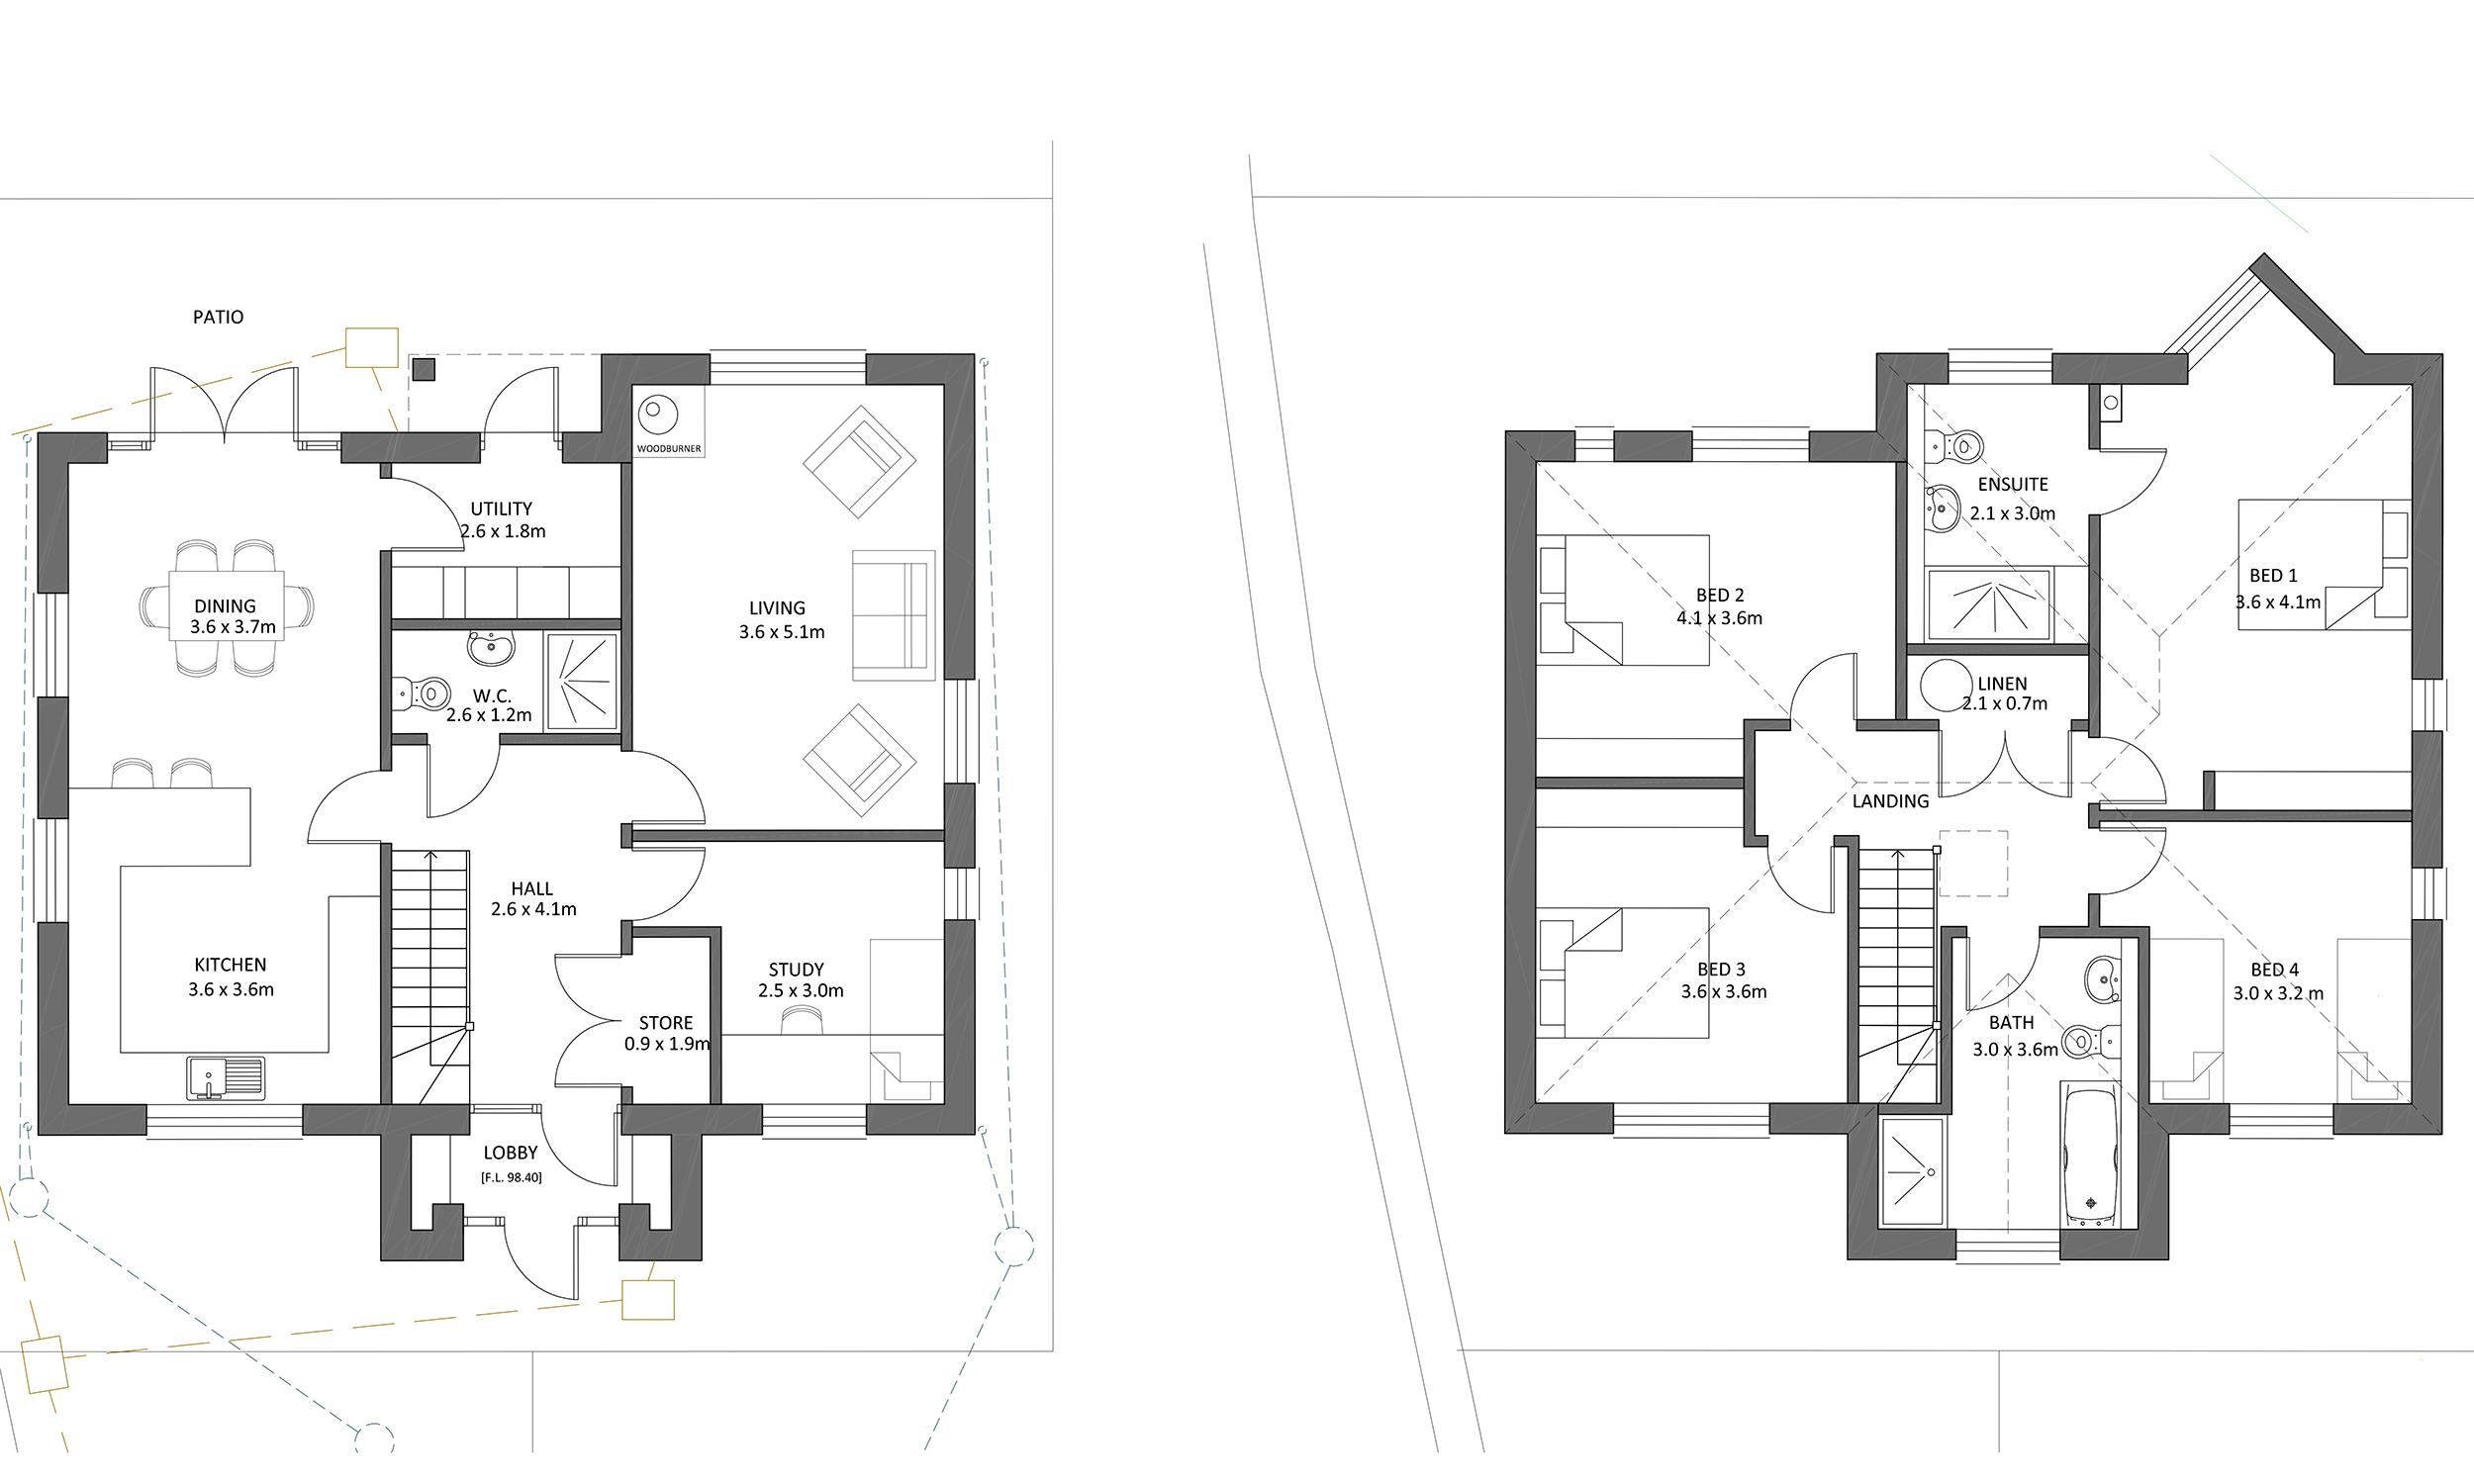 2305.D.11.C-Proposed-Plans.jpg